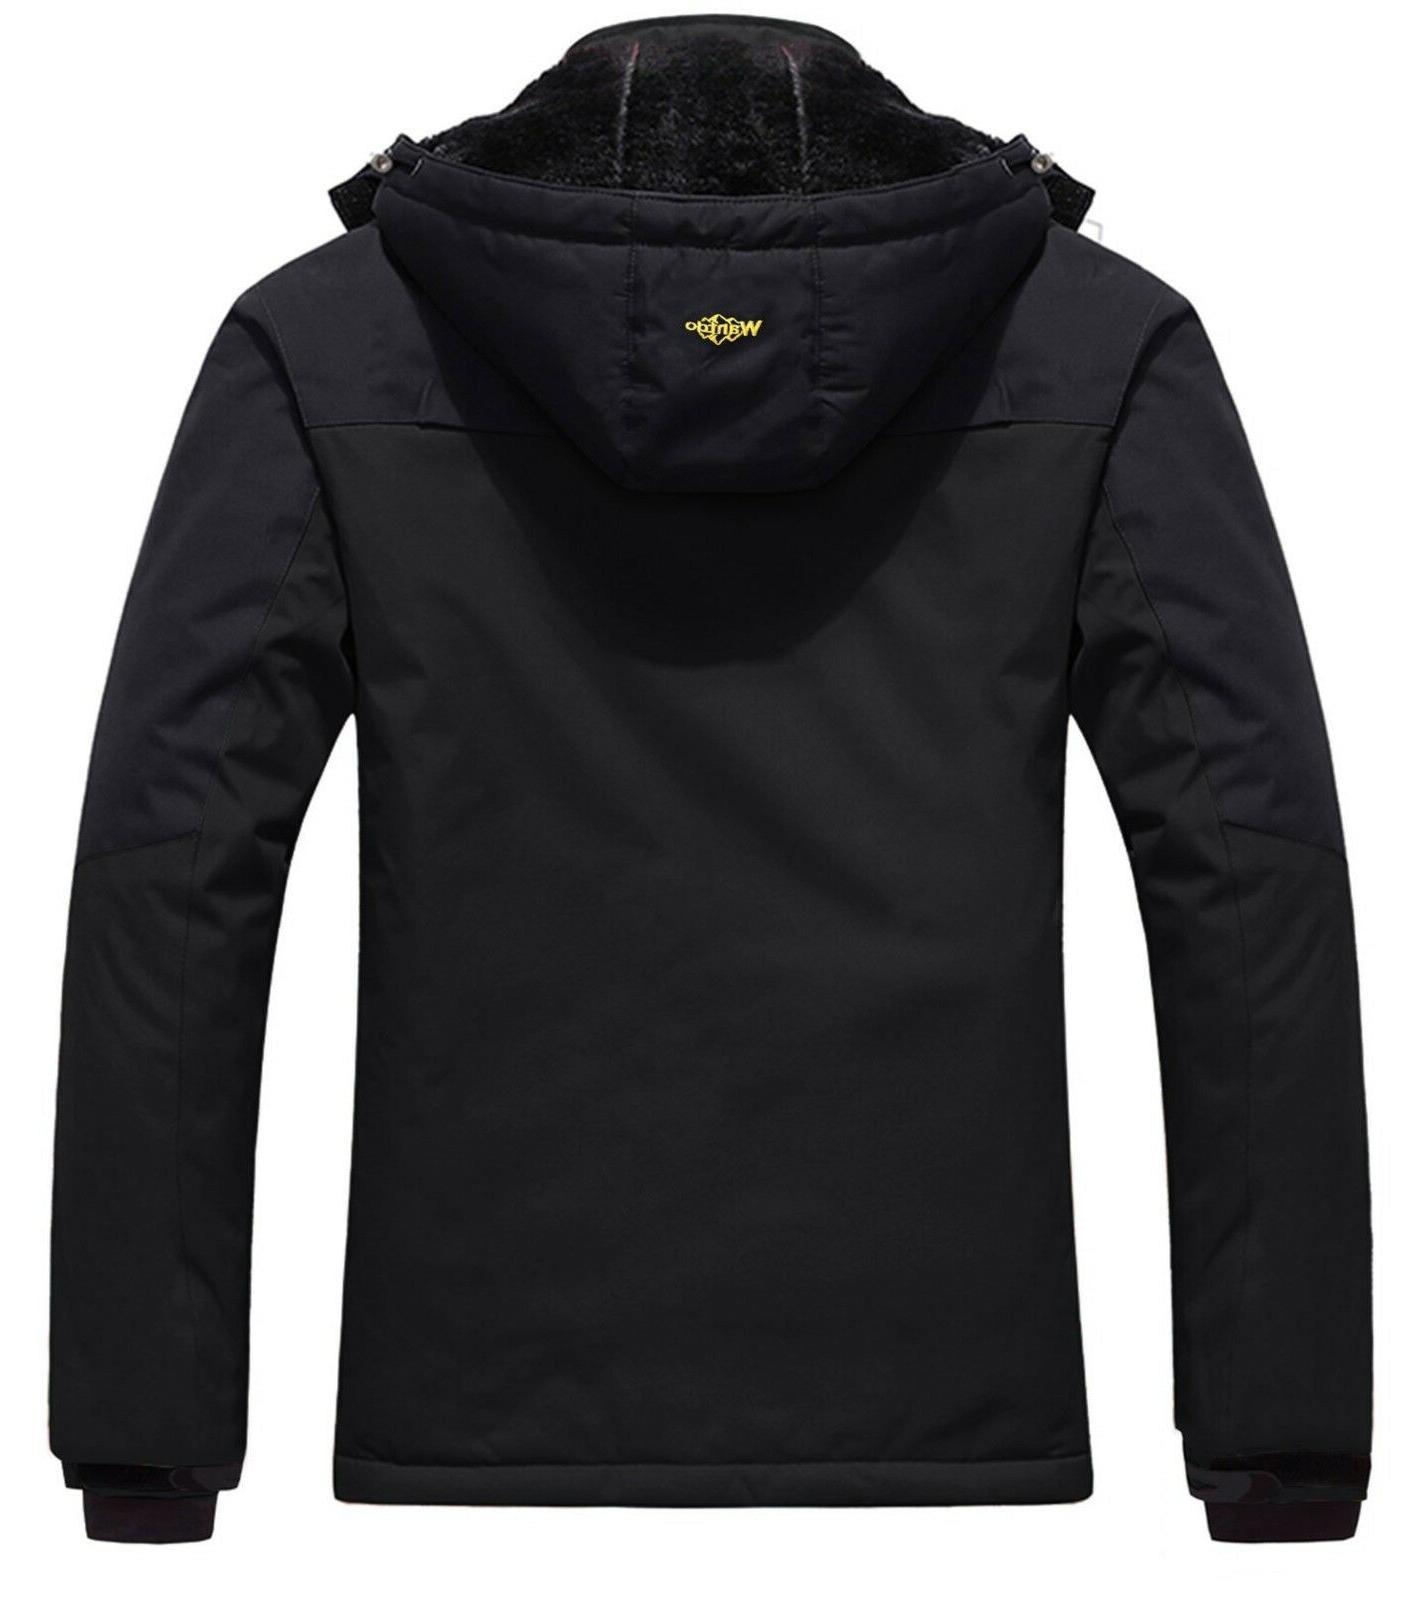 Wantdo Jacket Fleece Jacket US Black M